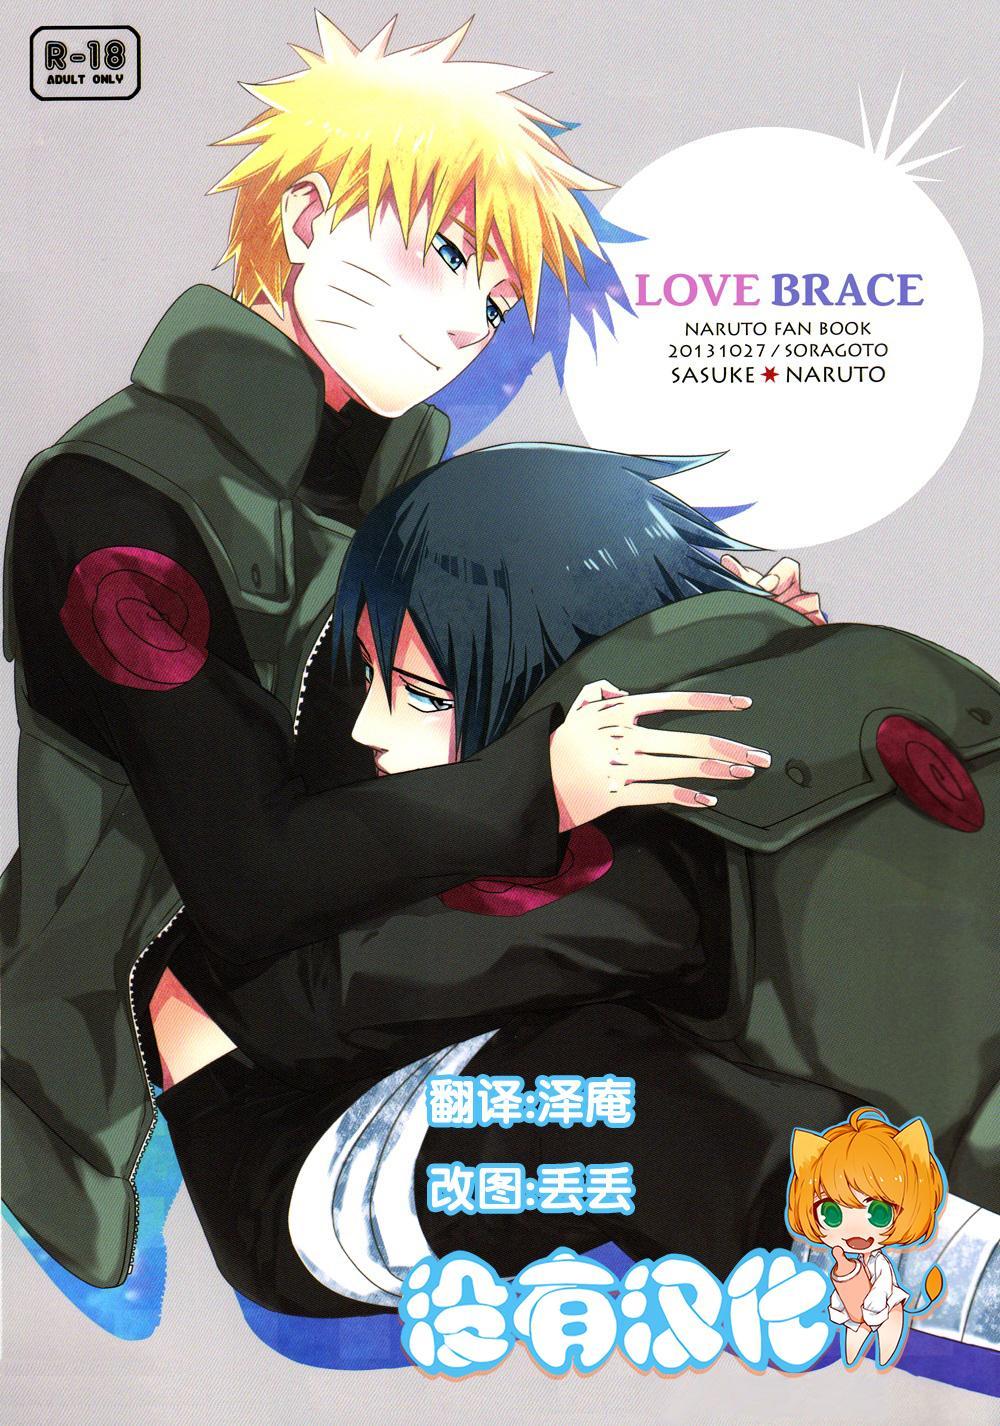 Love Brace 0